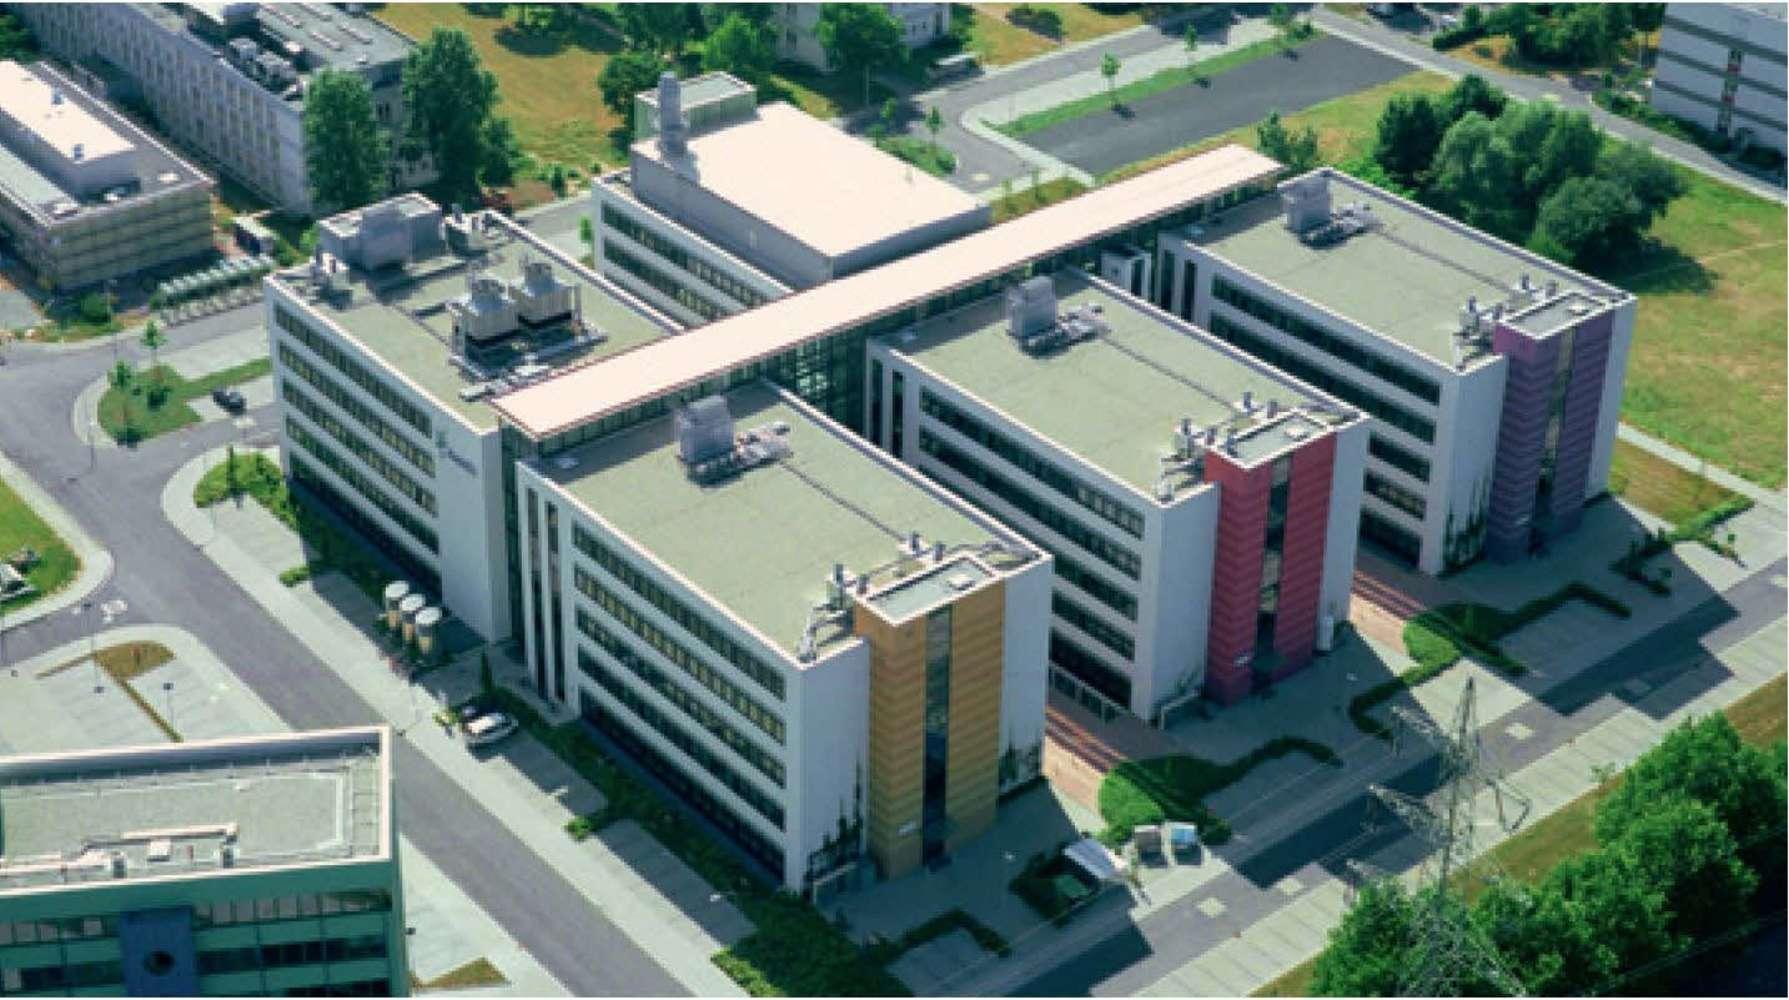 Büros Frankfurt am main, 65926 - Büro - Frankfurt am Main, Höchst - F2035 - 9412515